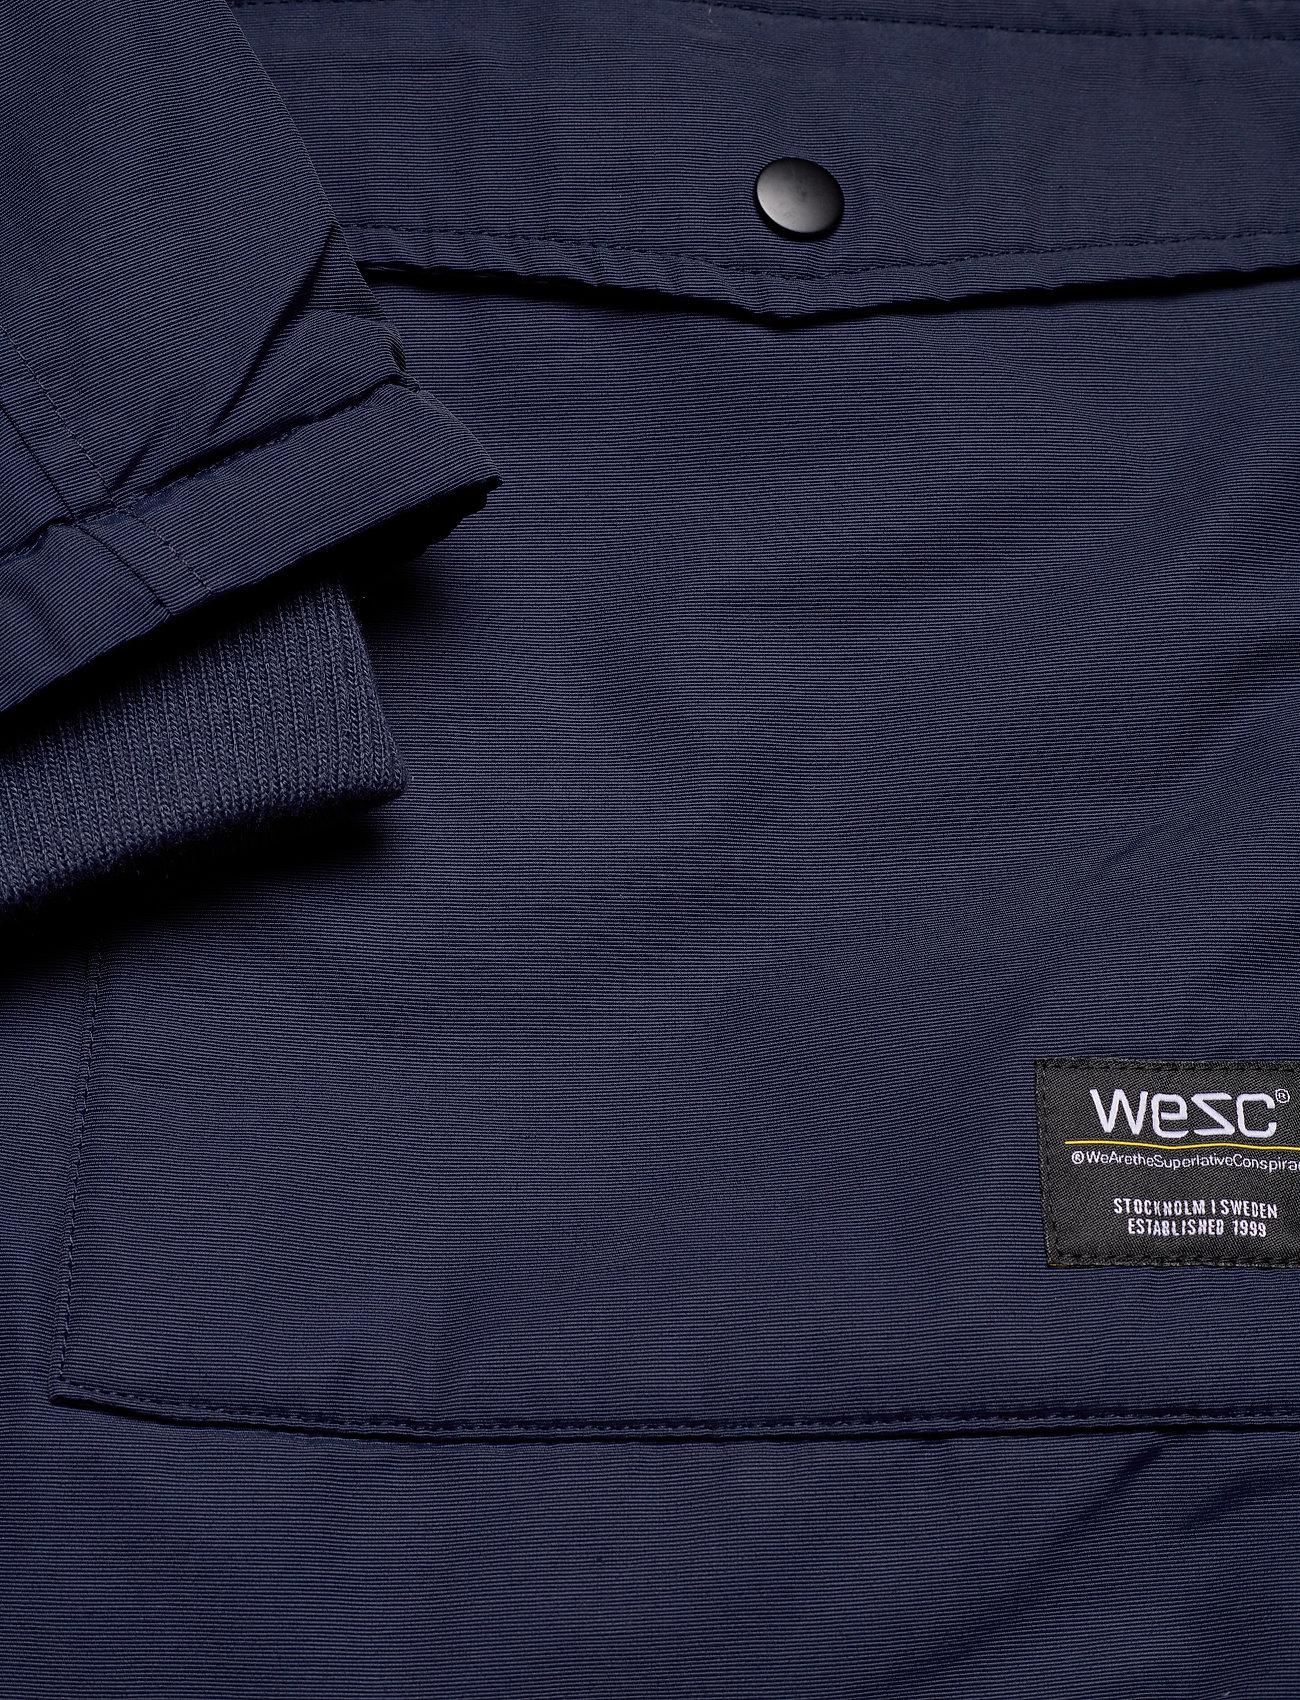 Winter Parka (Blueberry) (127.50 €) - WeSC XEj6d